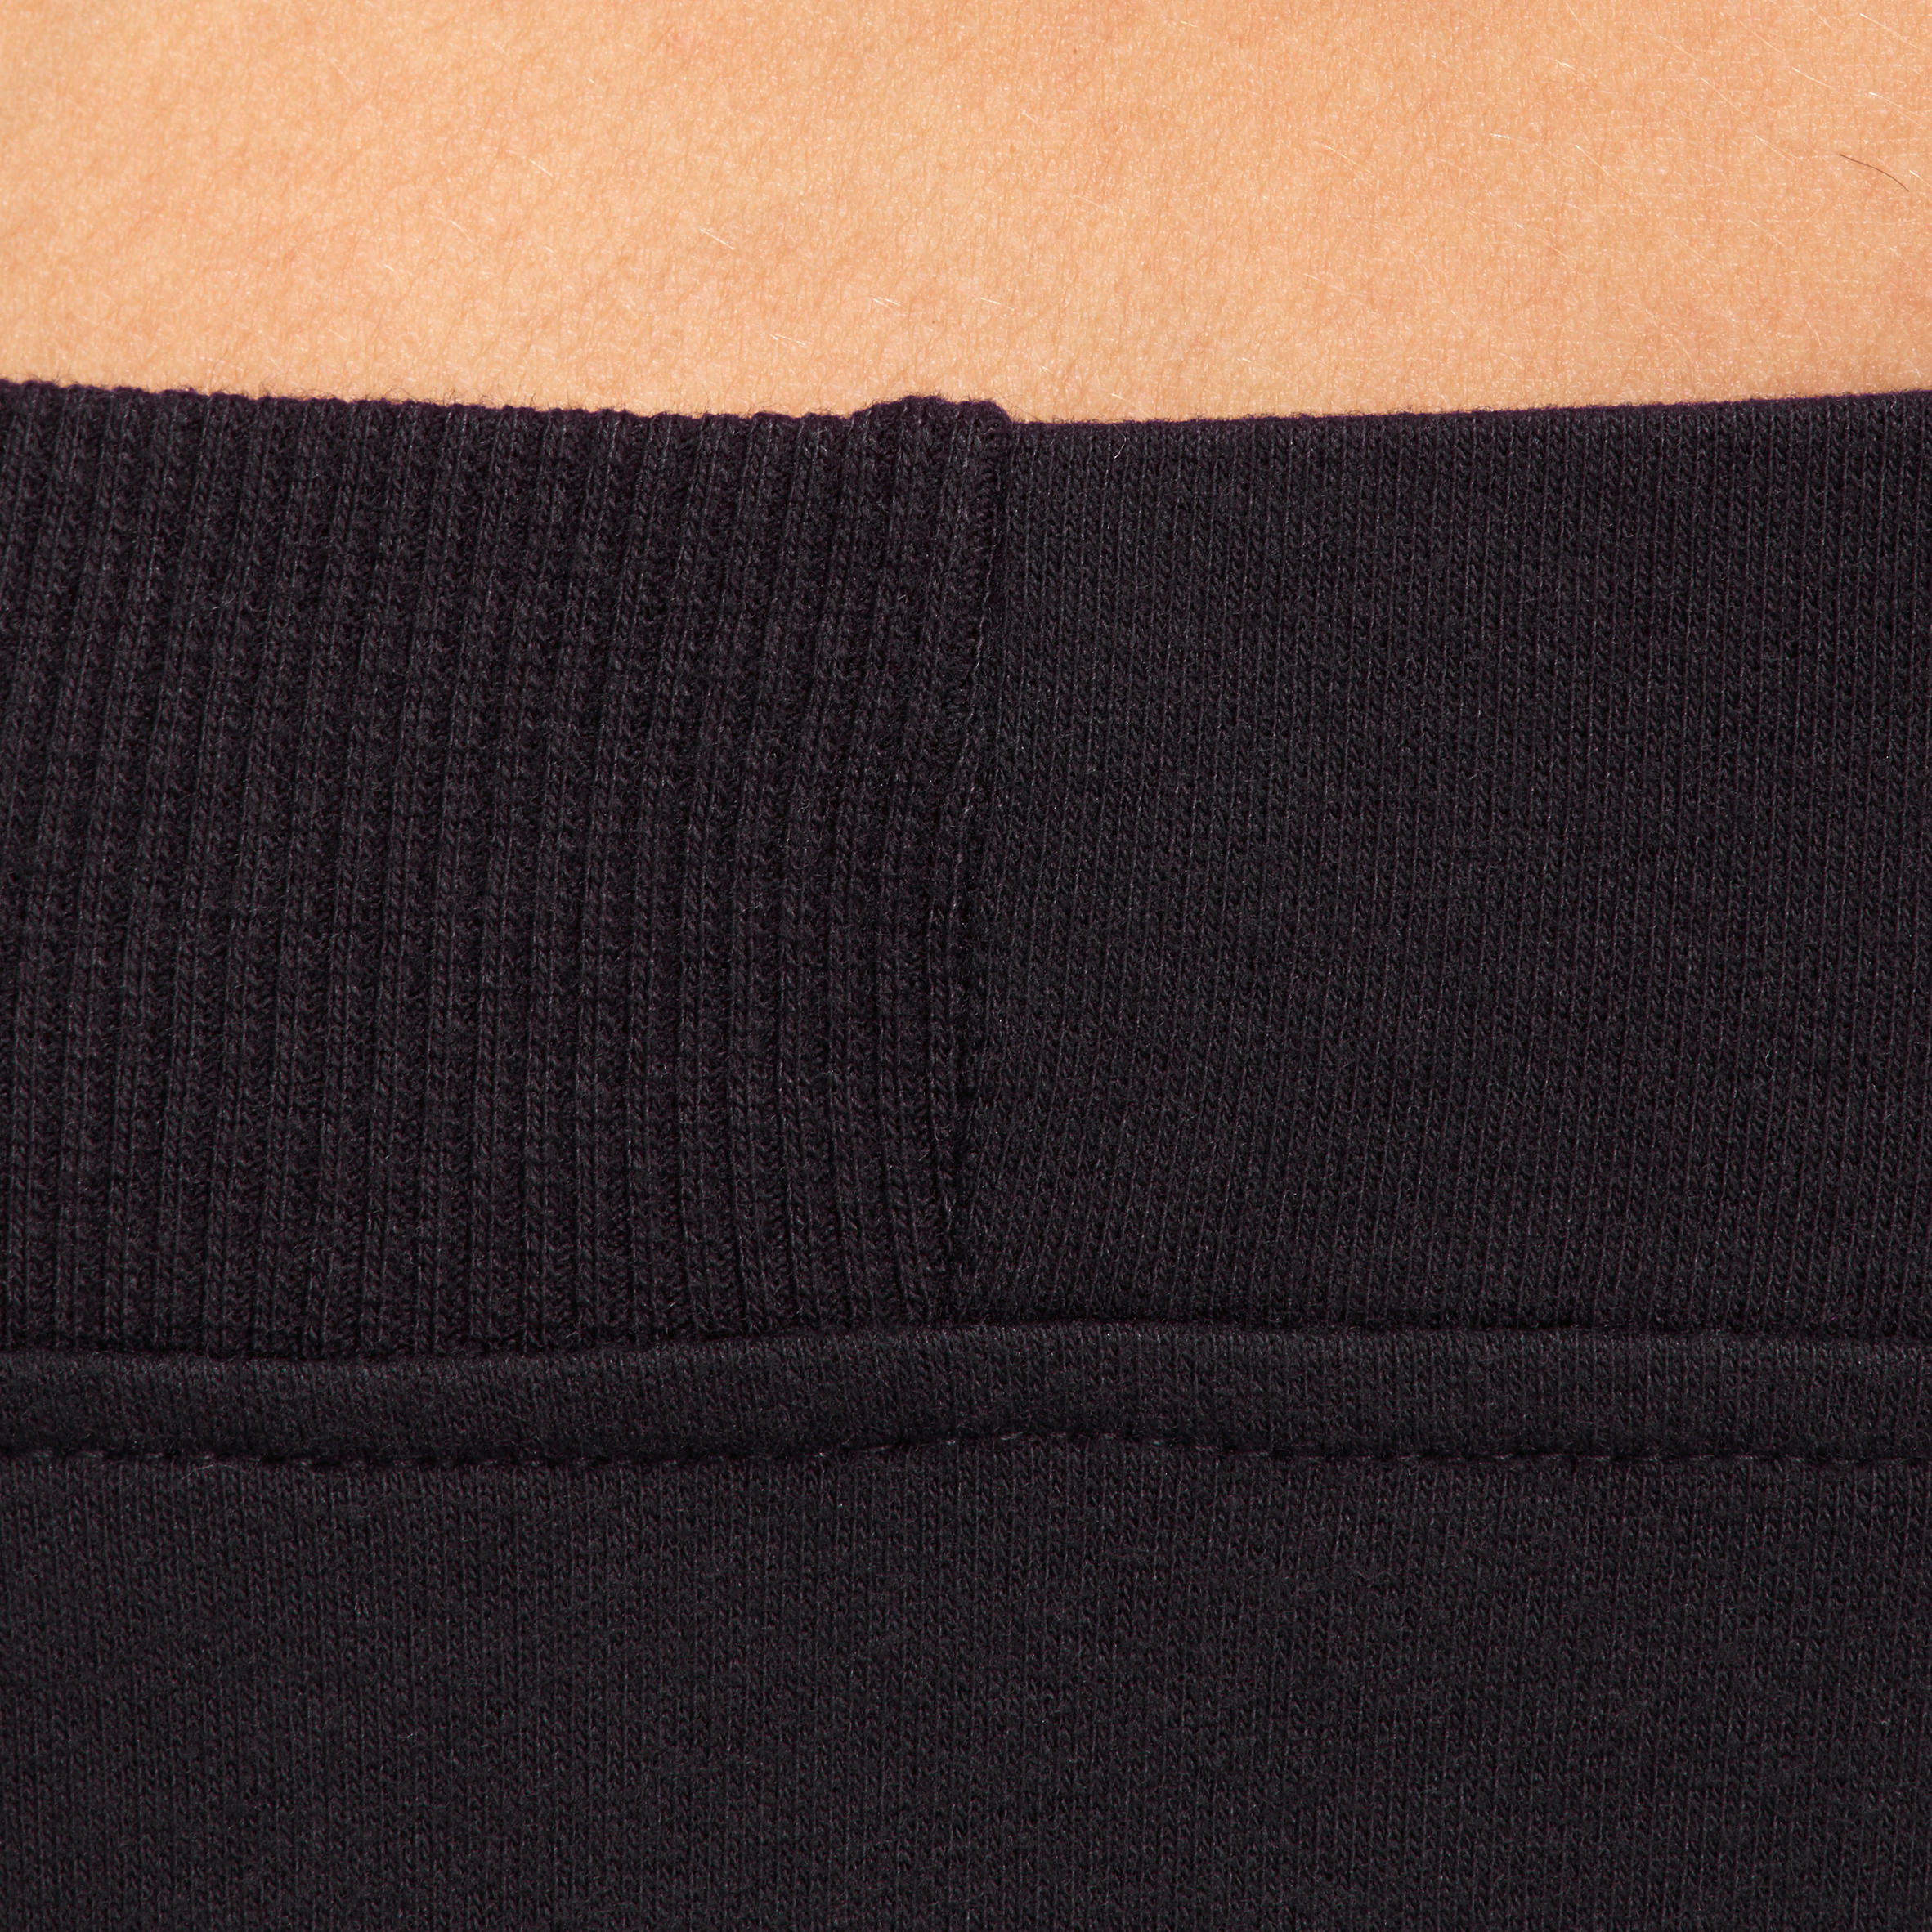 500 Women's Stretching Regular Bottoms - Black